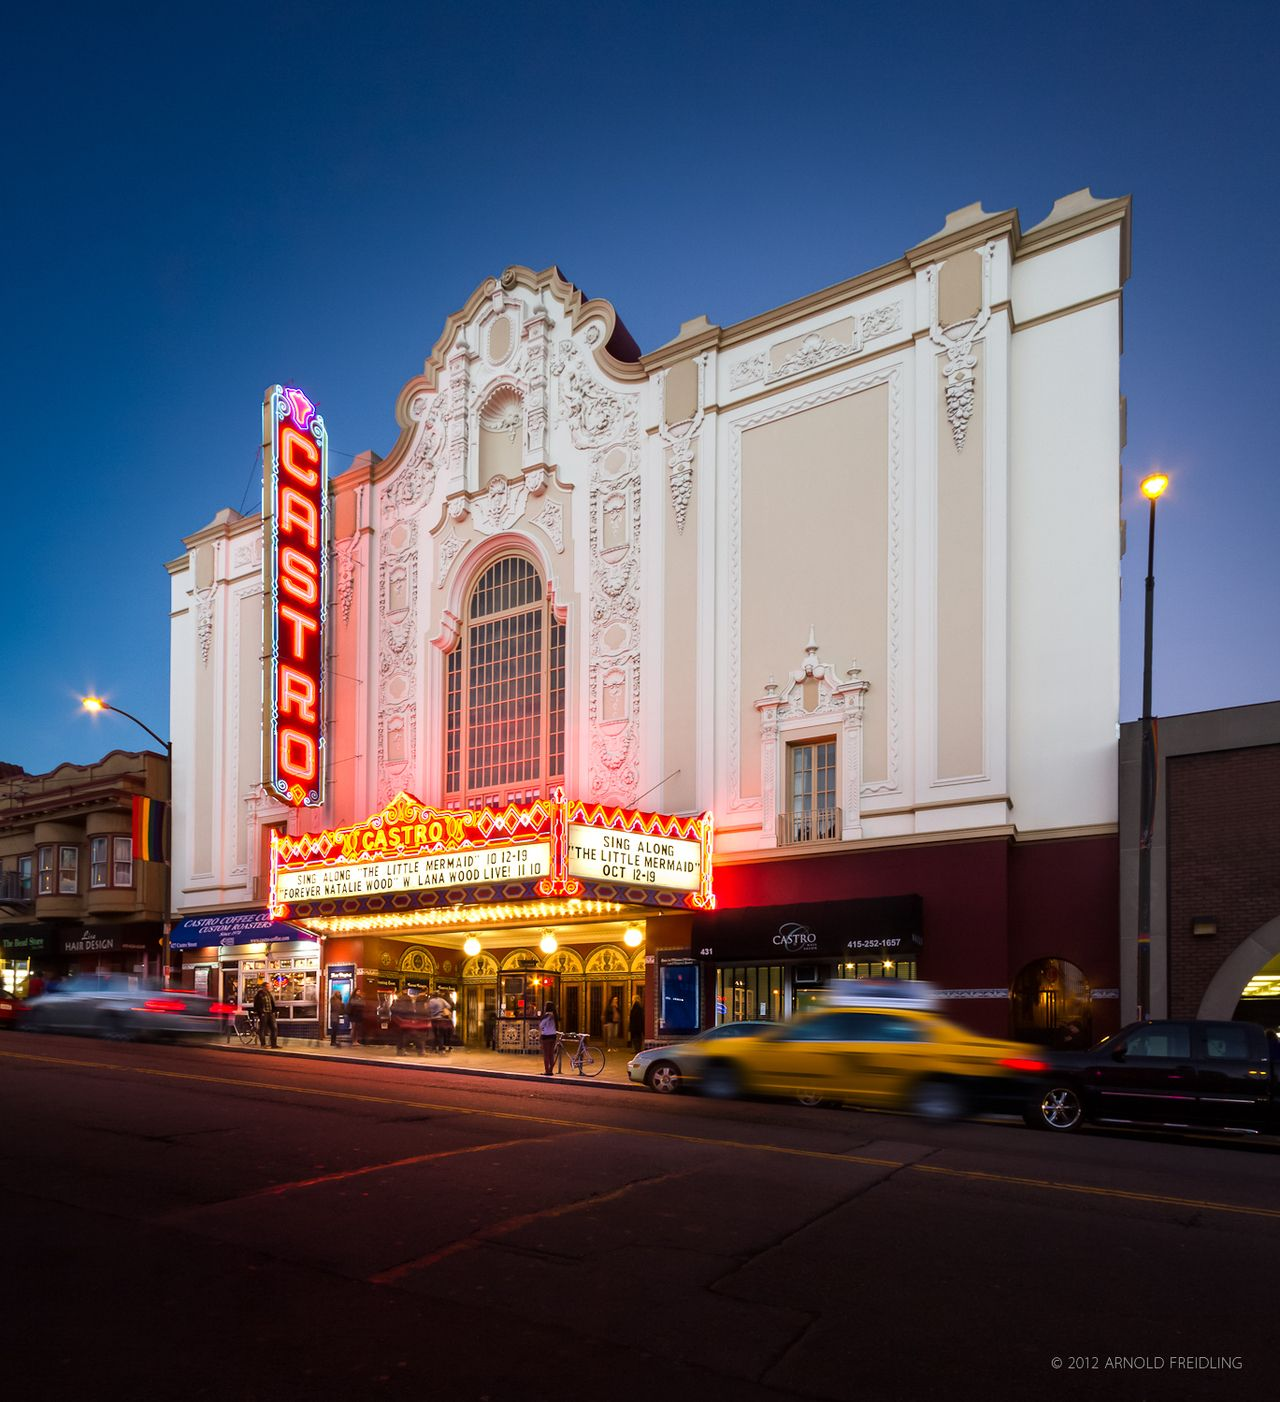 Castro Theatre 429 Castro Street San Francisco Ca 1500 Seats Opened In 1922 Architect Timothy L San Francisco Bay Area San Fransisco Castro Theater